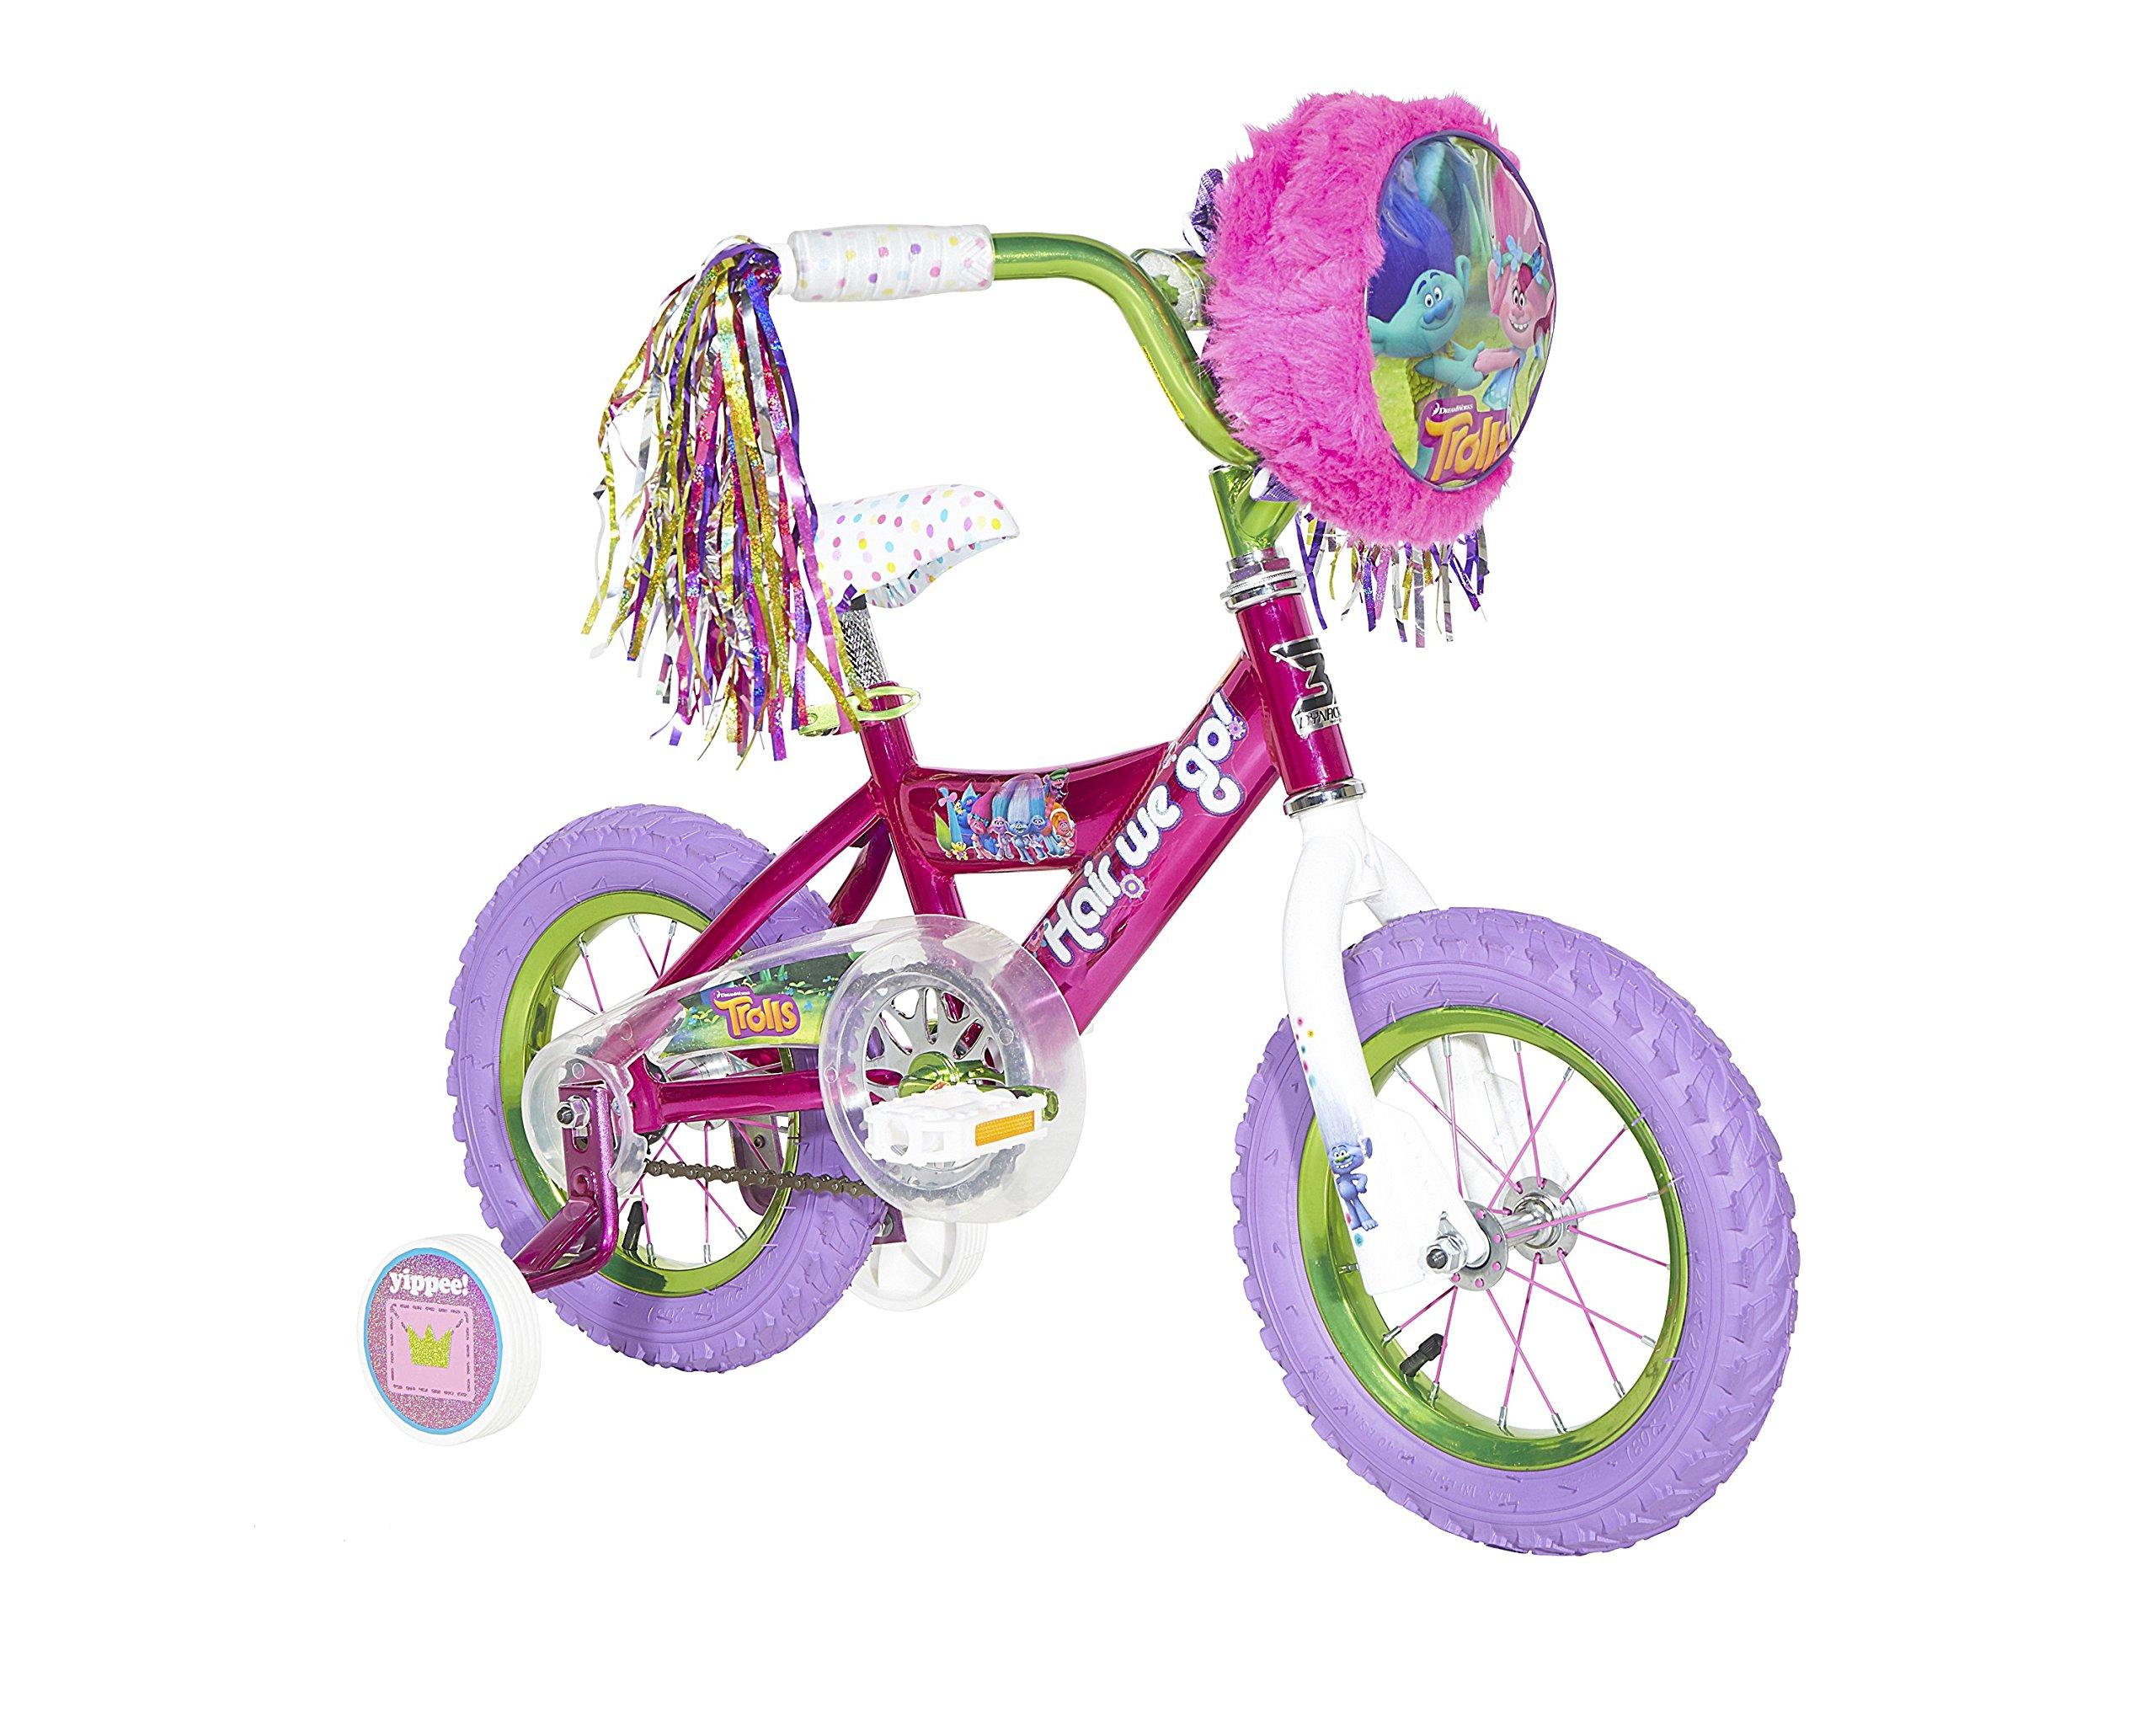 Trolls 12 Inch Girls' Bike